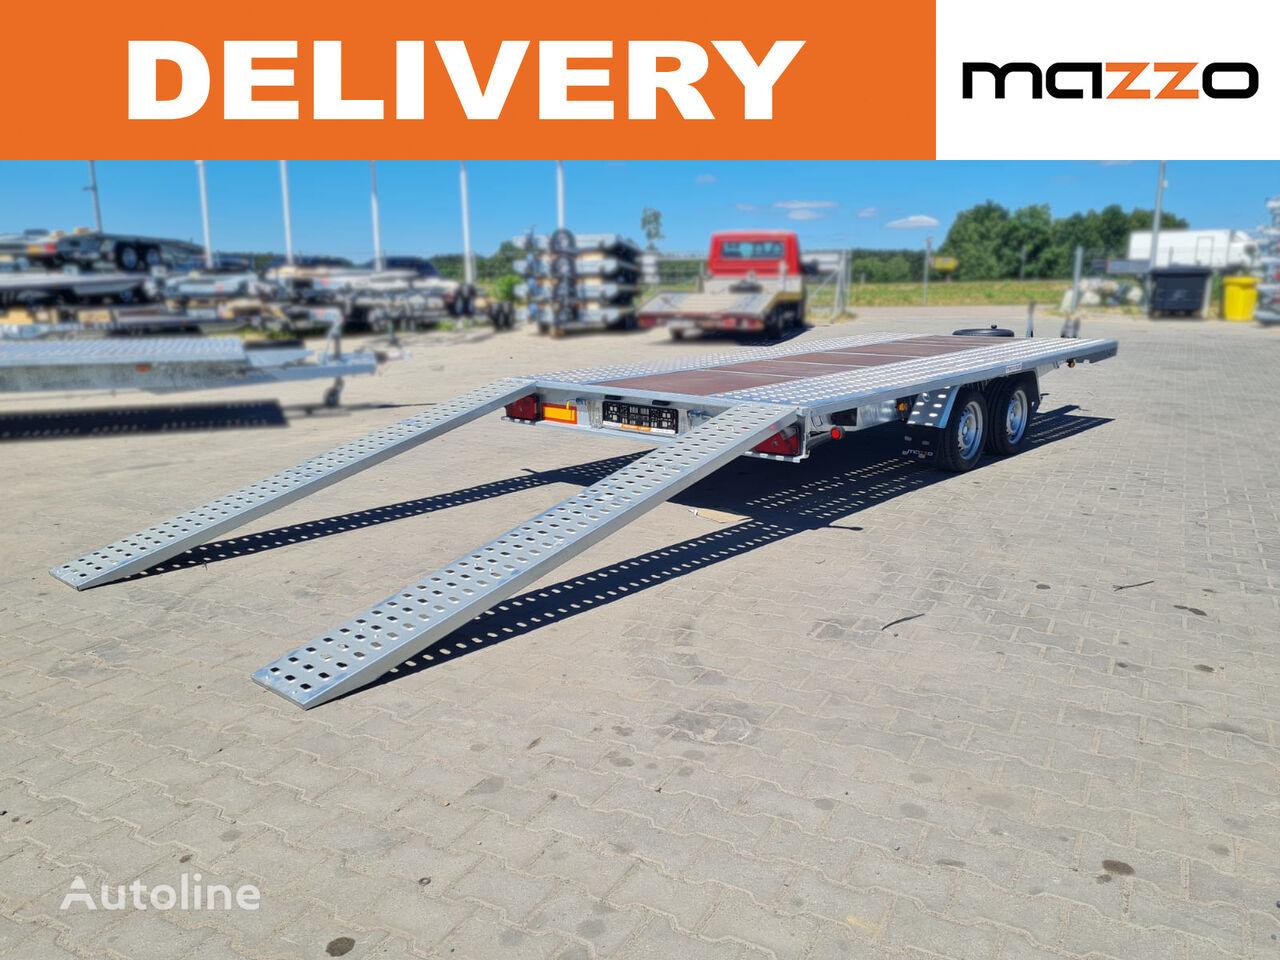 M4527 R13C 450x210 2700kg Platform remolque portacoches nuevo